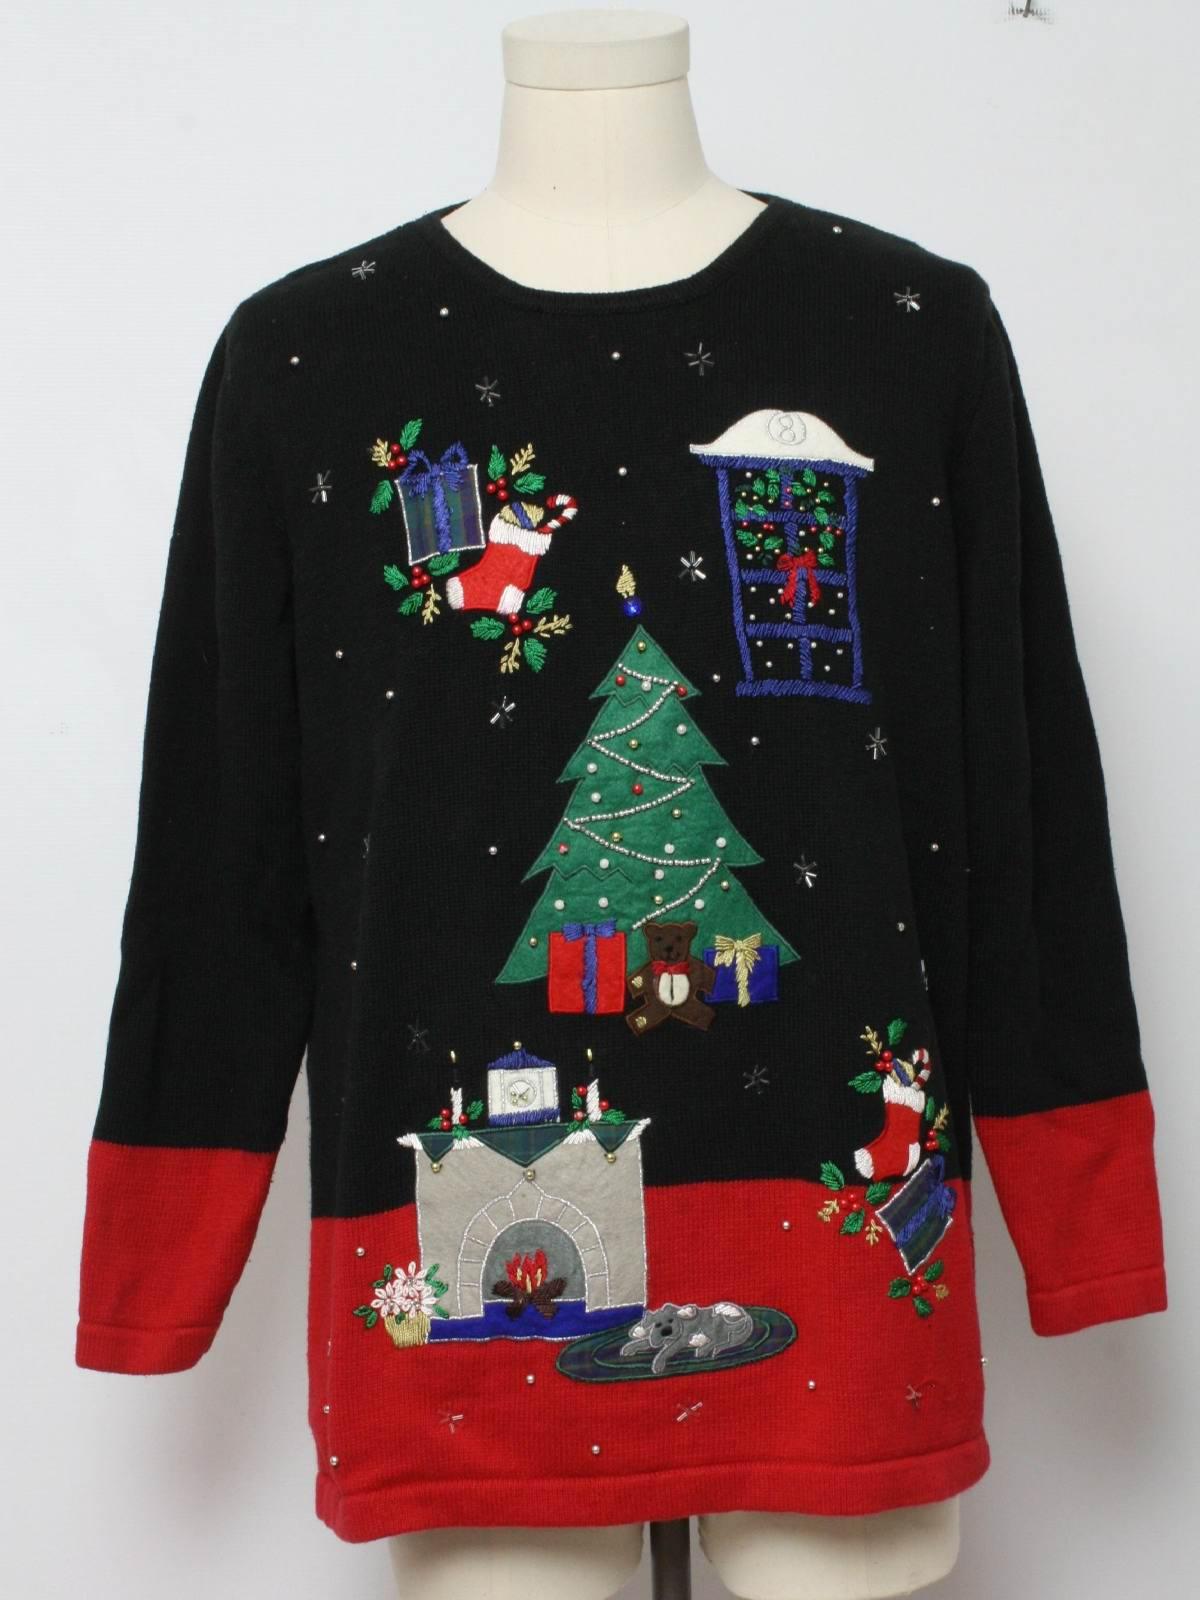 Vintage Nut Cracker Eighties Ugly Christmas Sweater 80s Authentic Vintage Nut Cracker Unisex